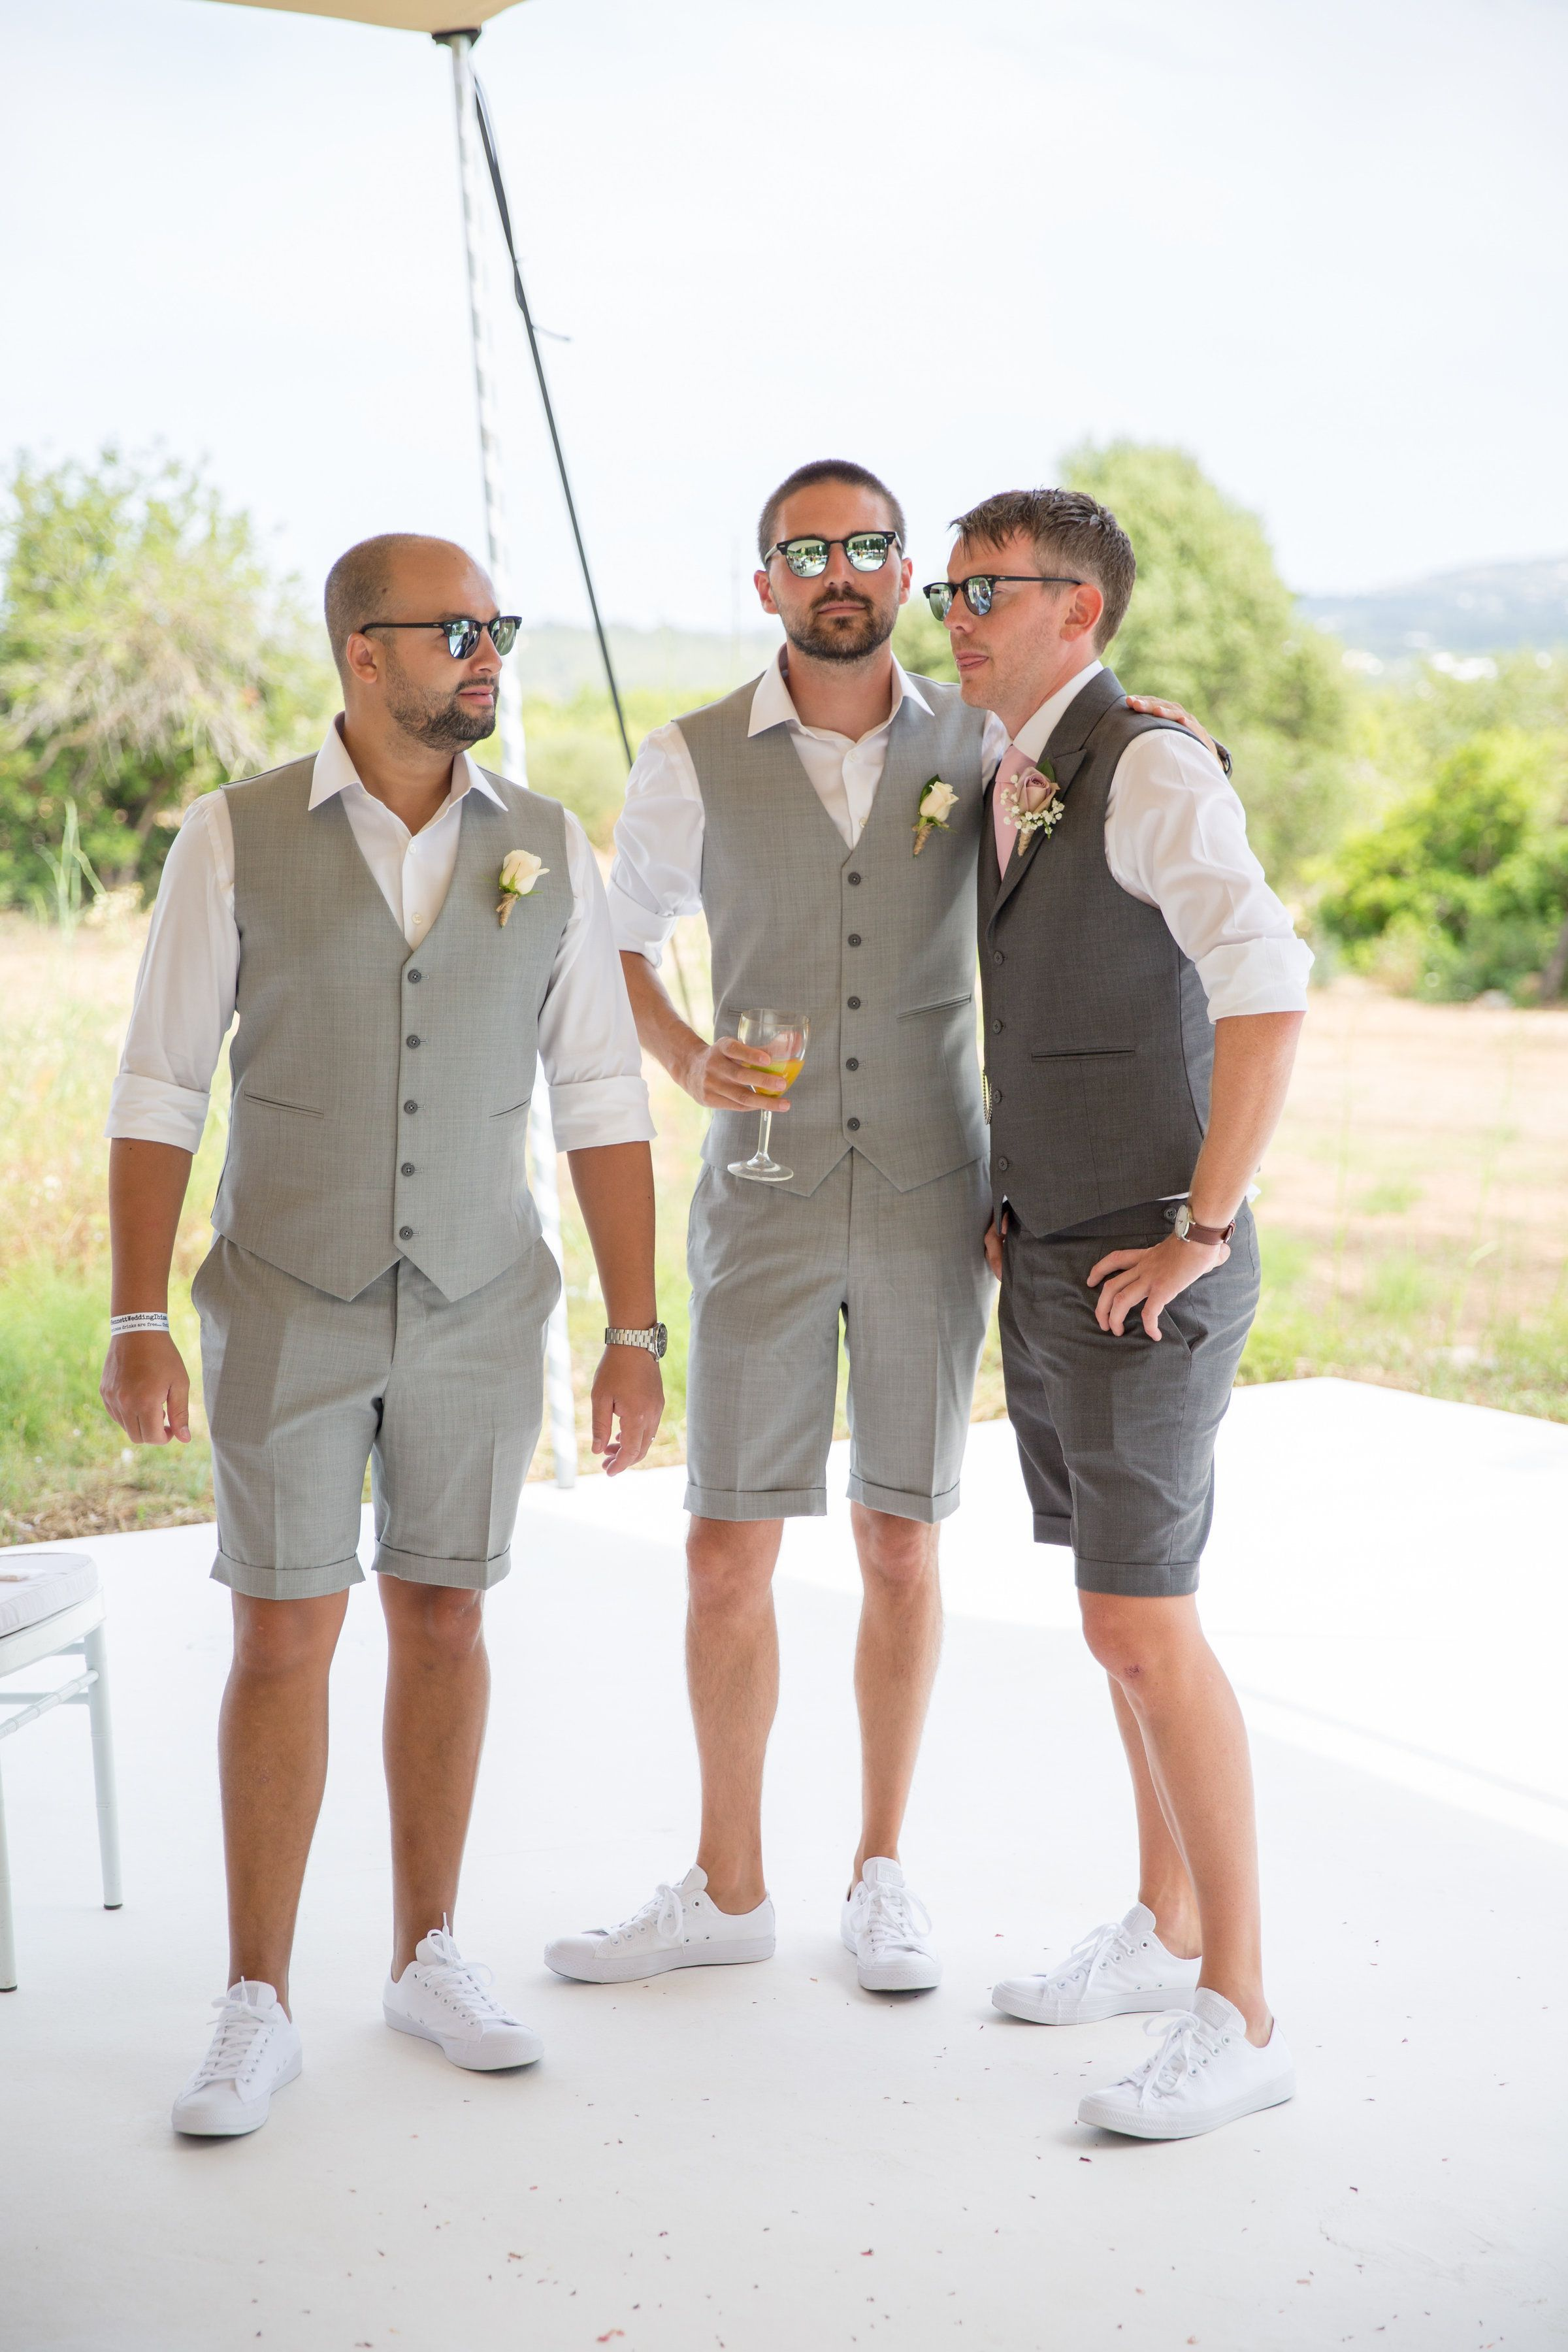 Secret Tips On Beach Wedding Etiquette For The Bride Beach Wedding Groom Attire Shorts B In 2020 Groomsmen Beach Attire Casual Groomsmen Mens Casual Wedding Attire